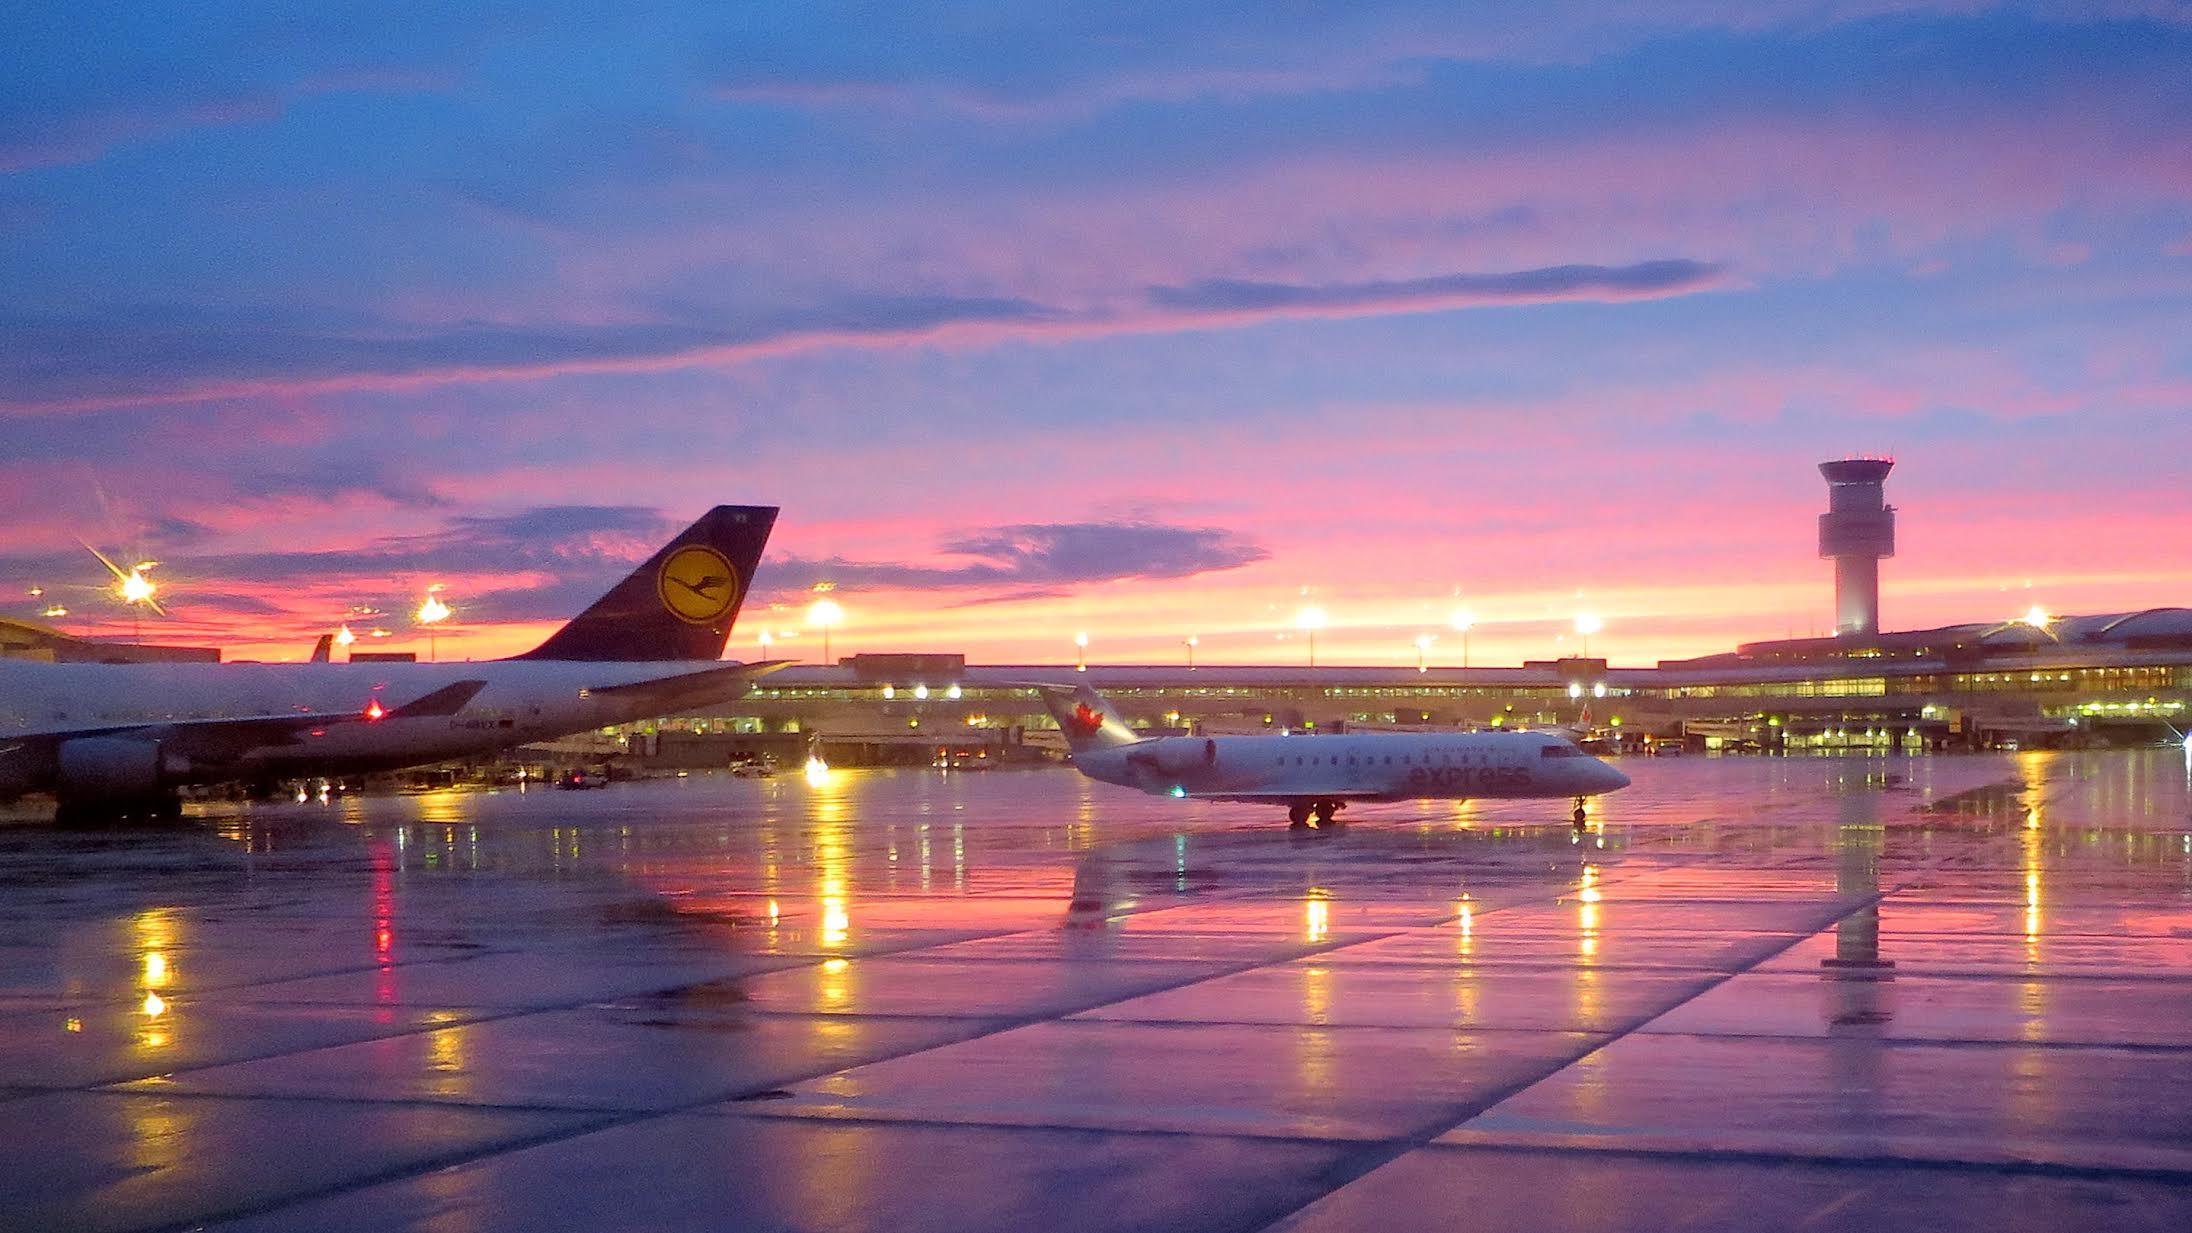 Pearson-Terminal-One-Ramp-at-Sunset-1.jpg